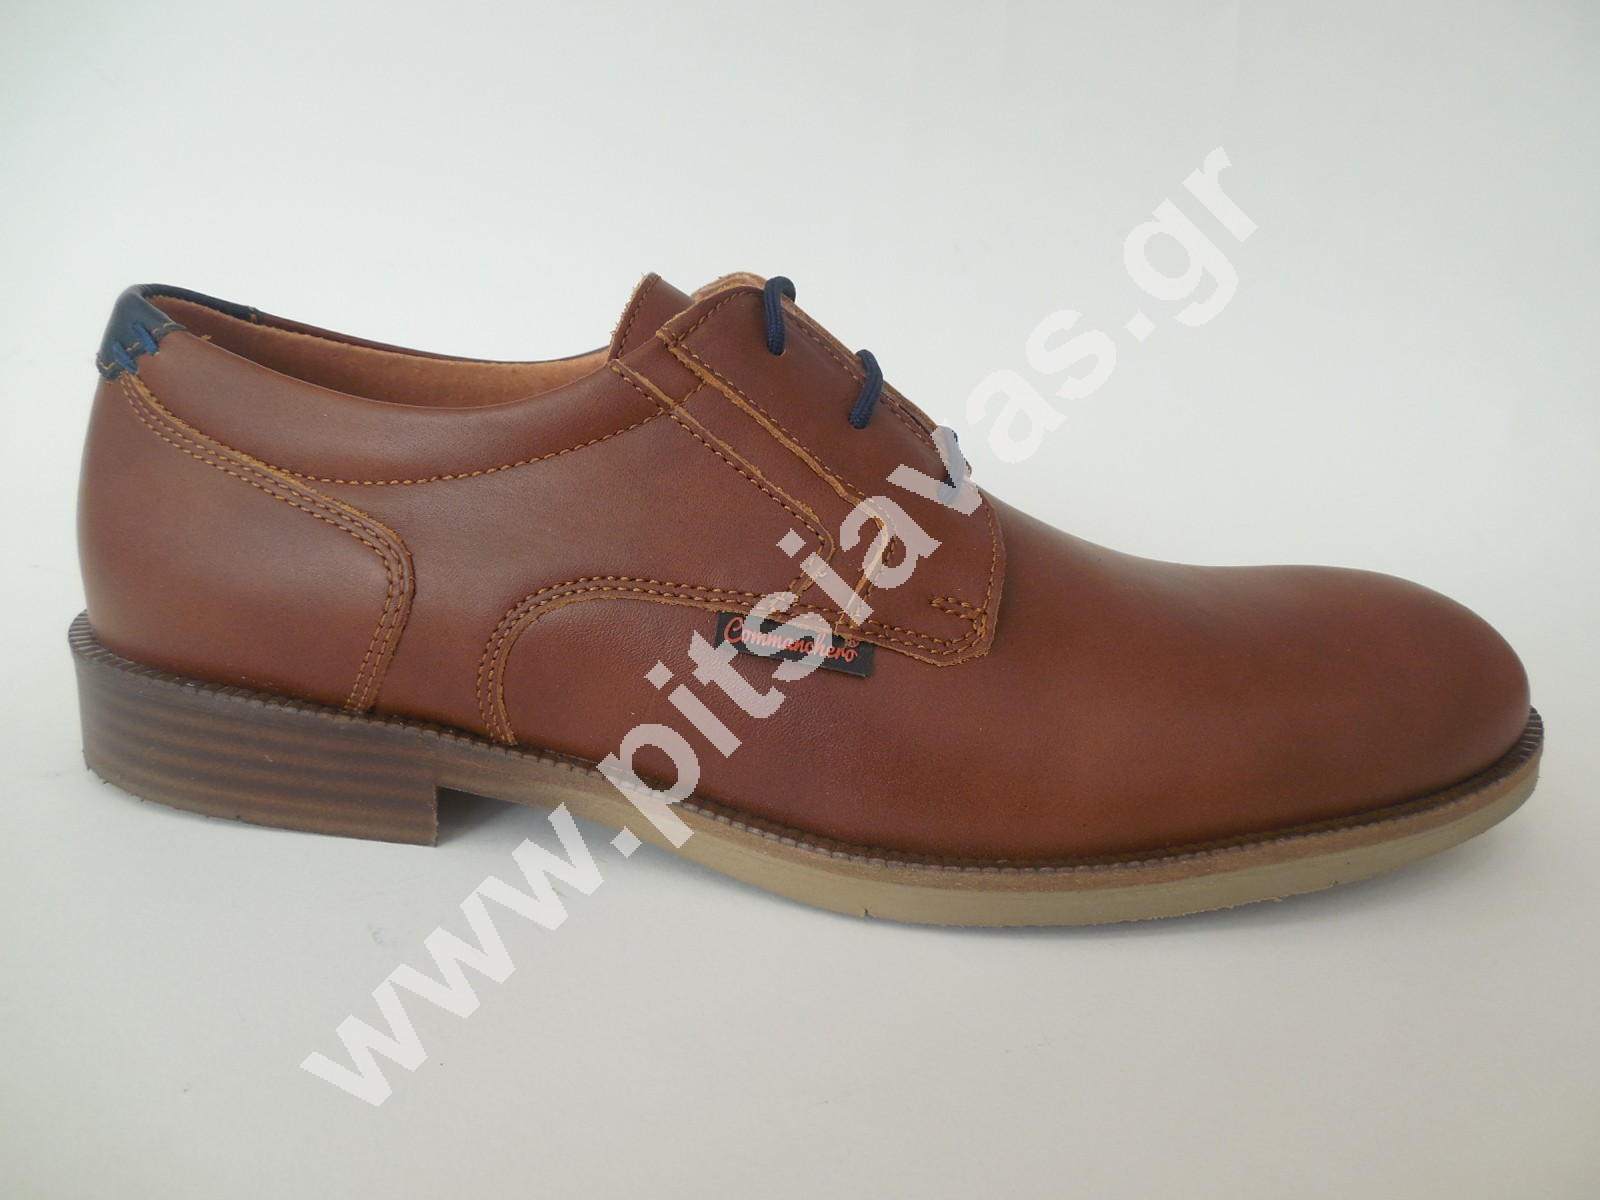 8d626fefd28 Commanchero ανδρικό παπούτσι 91693 ταμπά δέρμα - pitsiavas